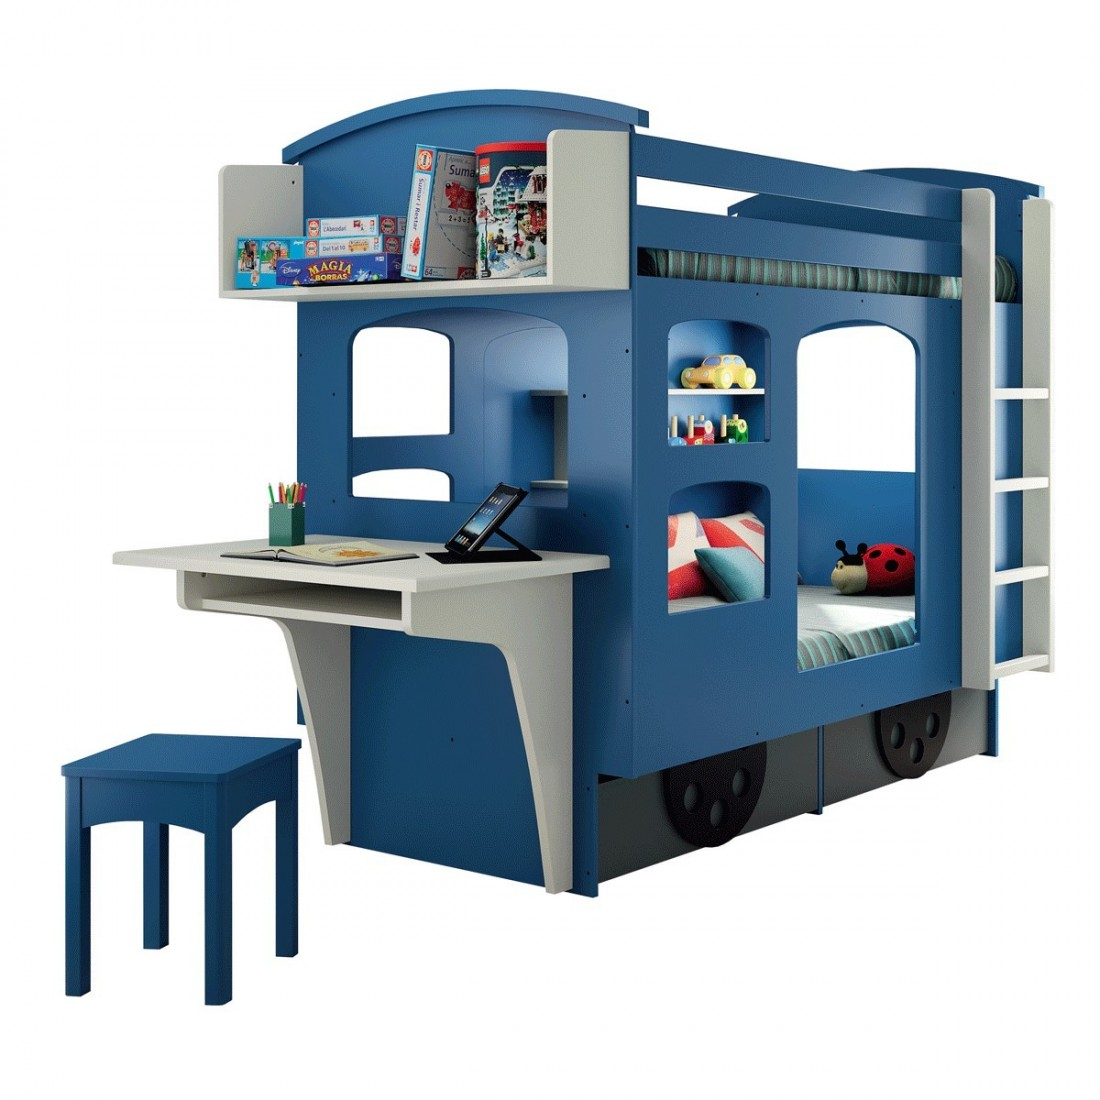 lit superpos cabane train wagon couleurs au choix ma chambramoi. Black Bedroom Furniture Sets. Home Design Ideas